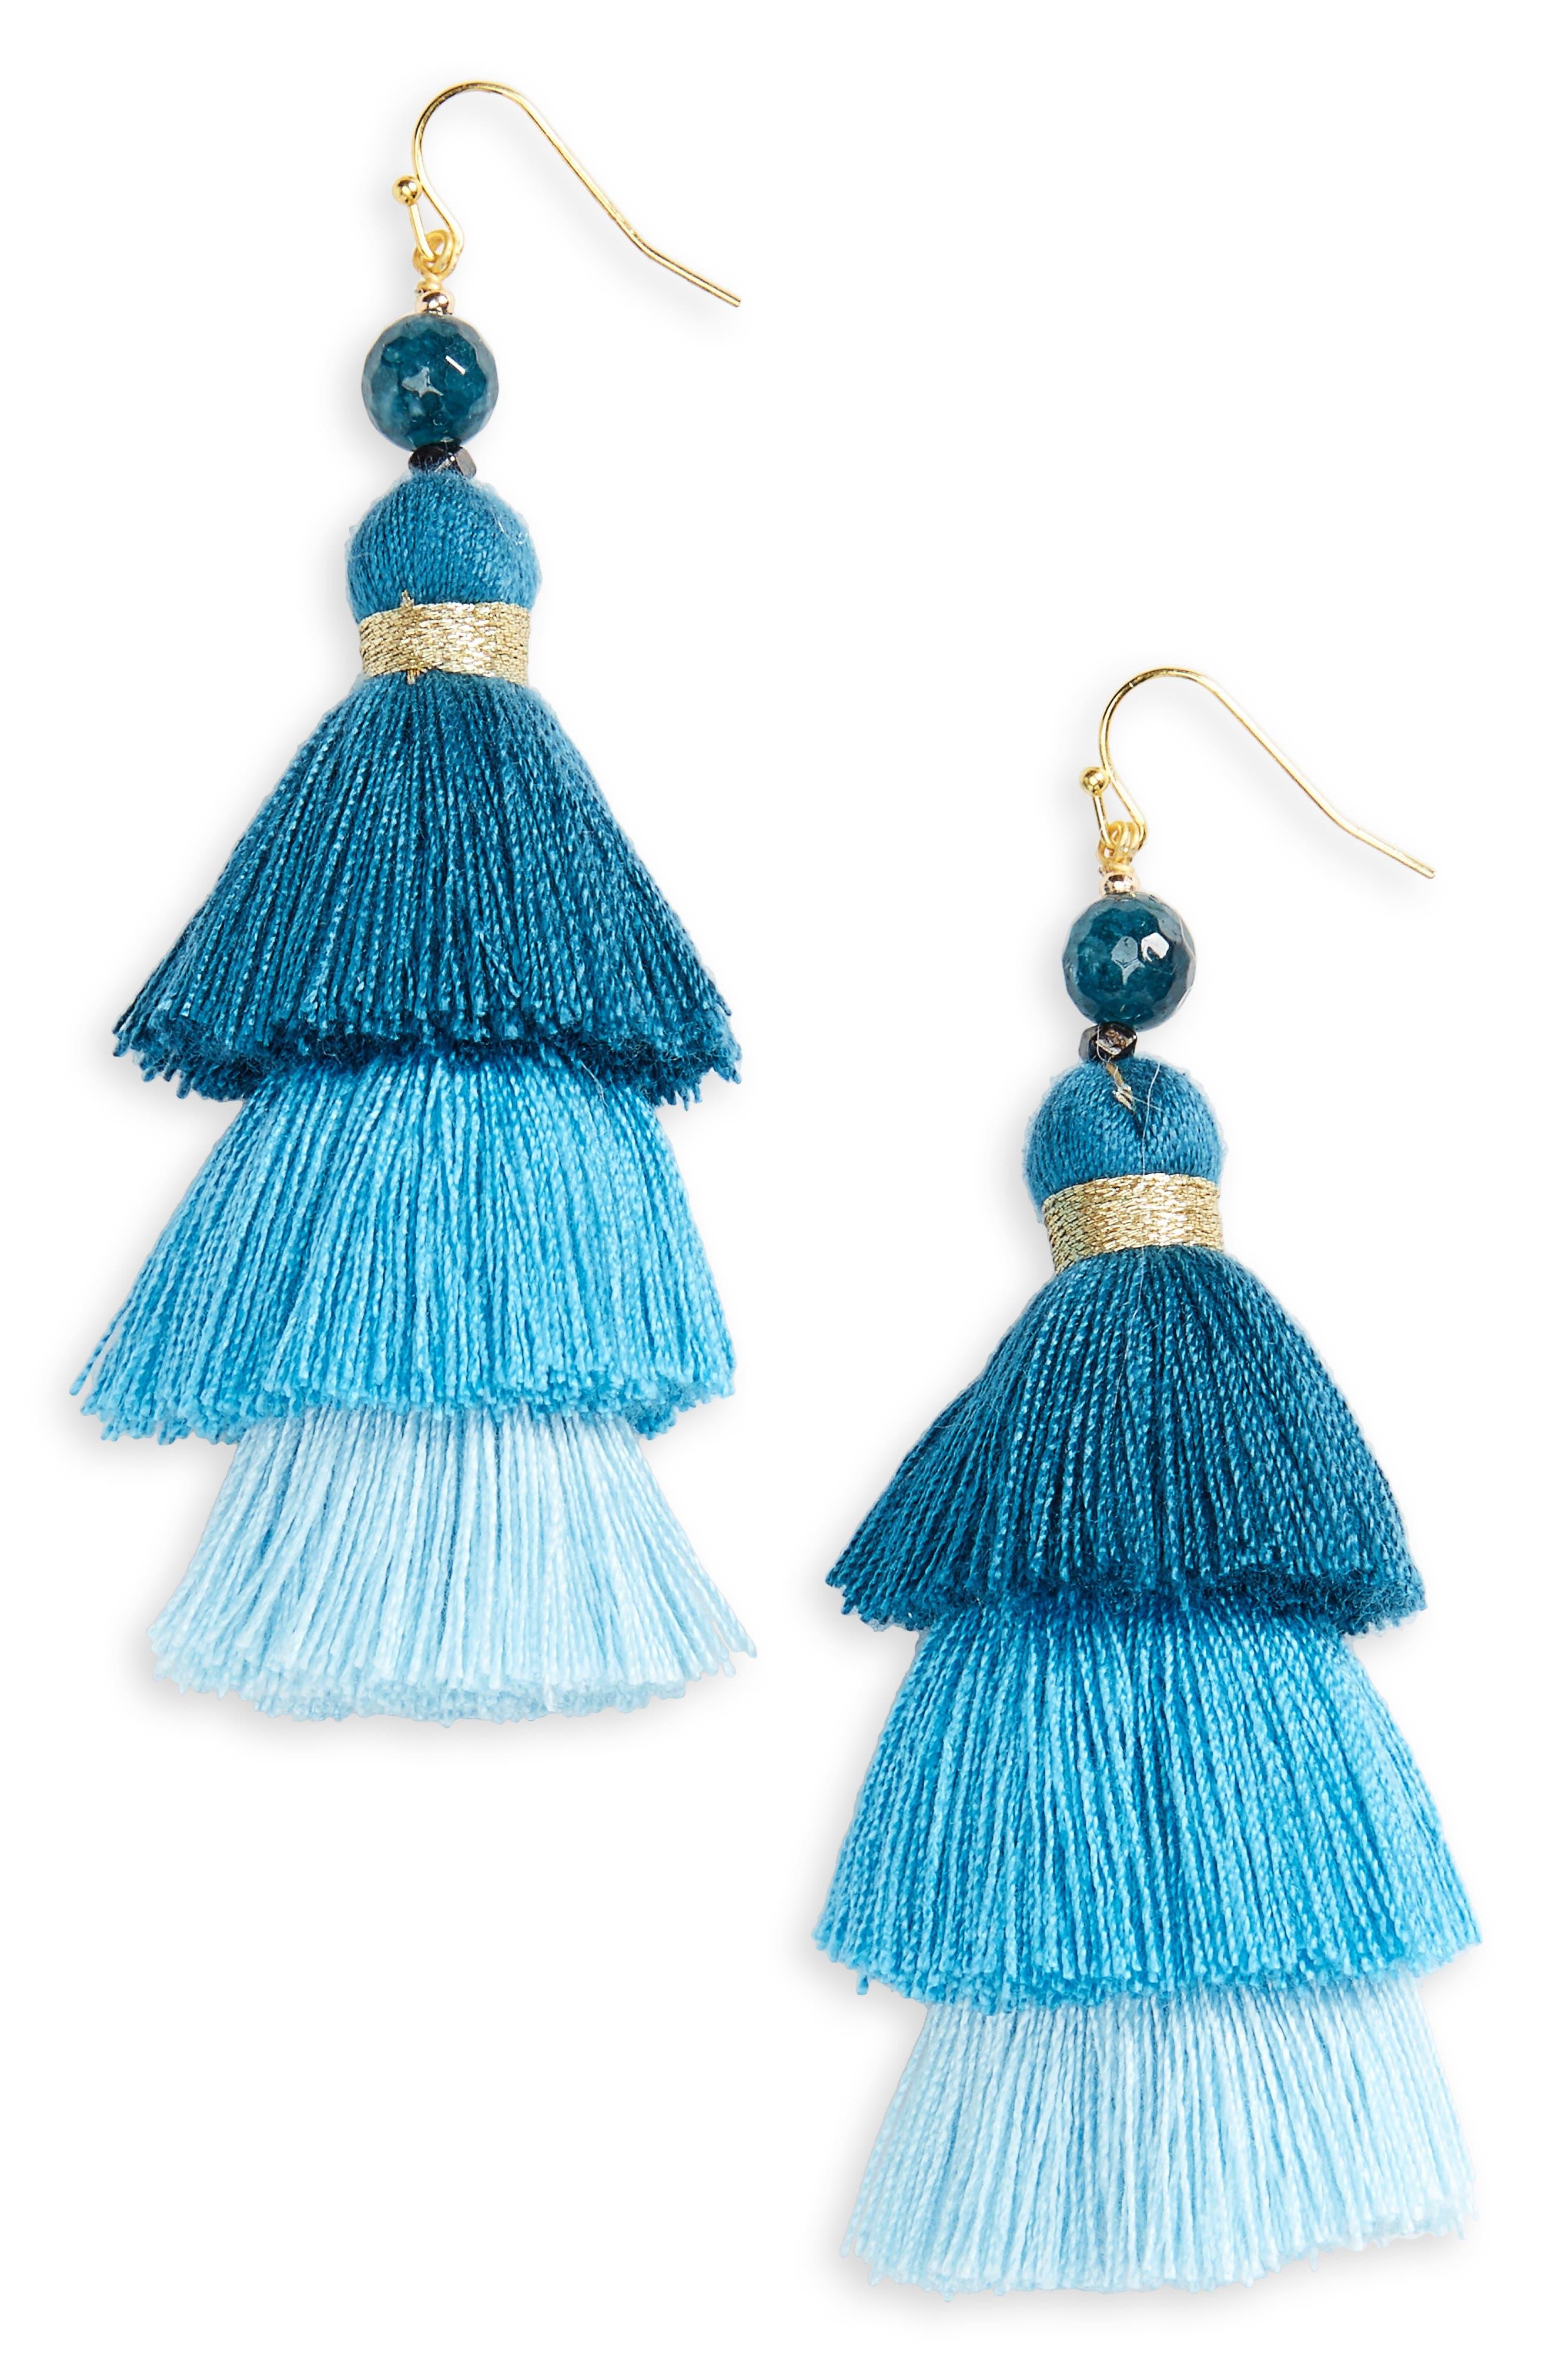 Main Image - Nakamol Design Layered Tassel Statement Earrings